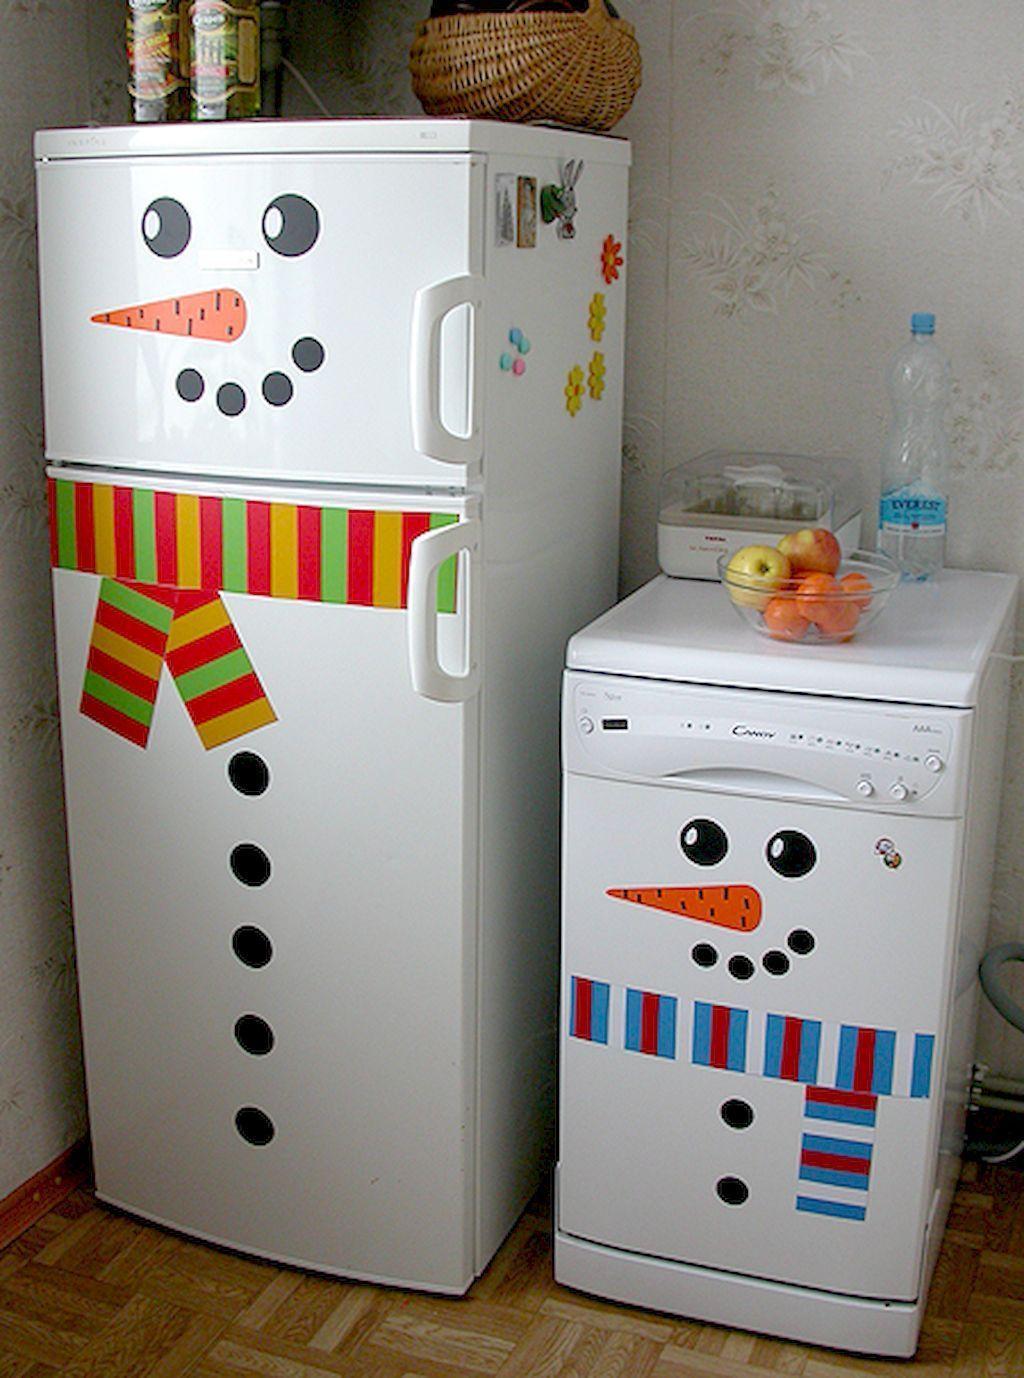 20 Apartment Decorating Ideas On A Budget - KATYDIDANDKID #smallapartmentchristmasdecor